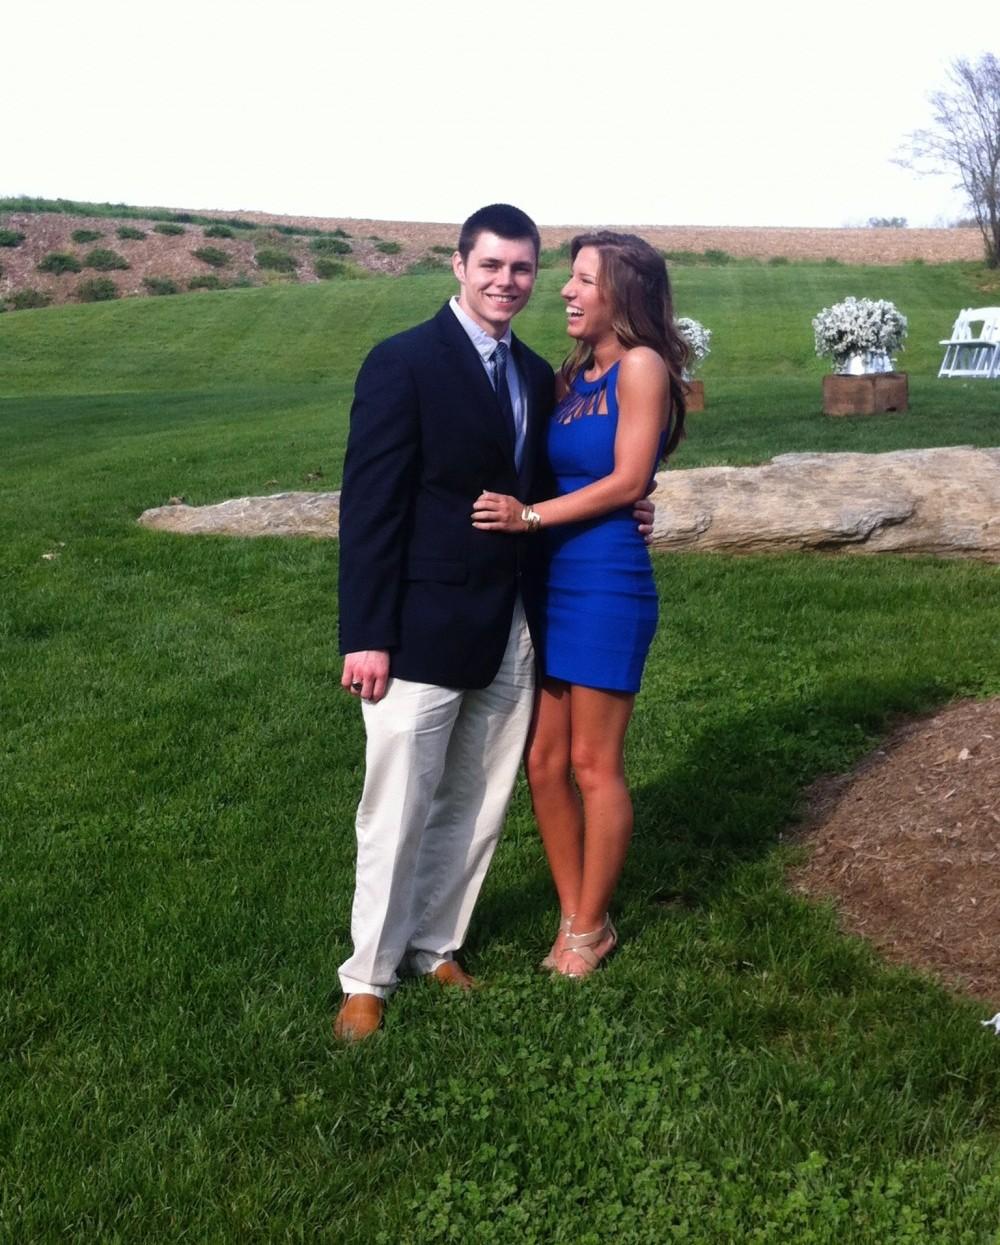 Bride's Proposal in piedmont, sc